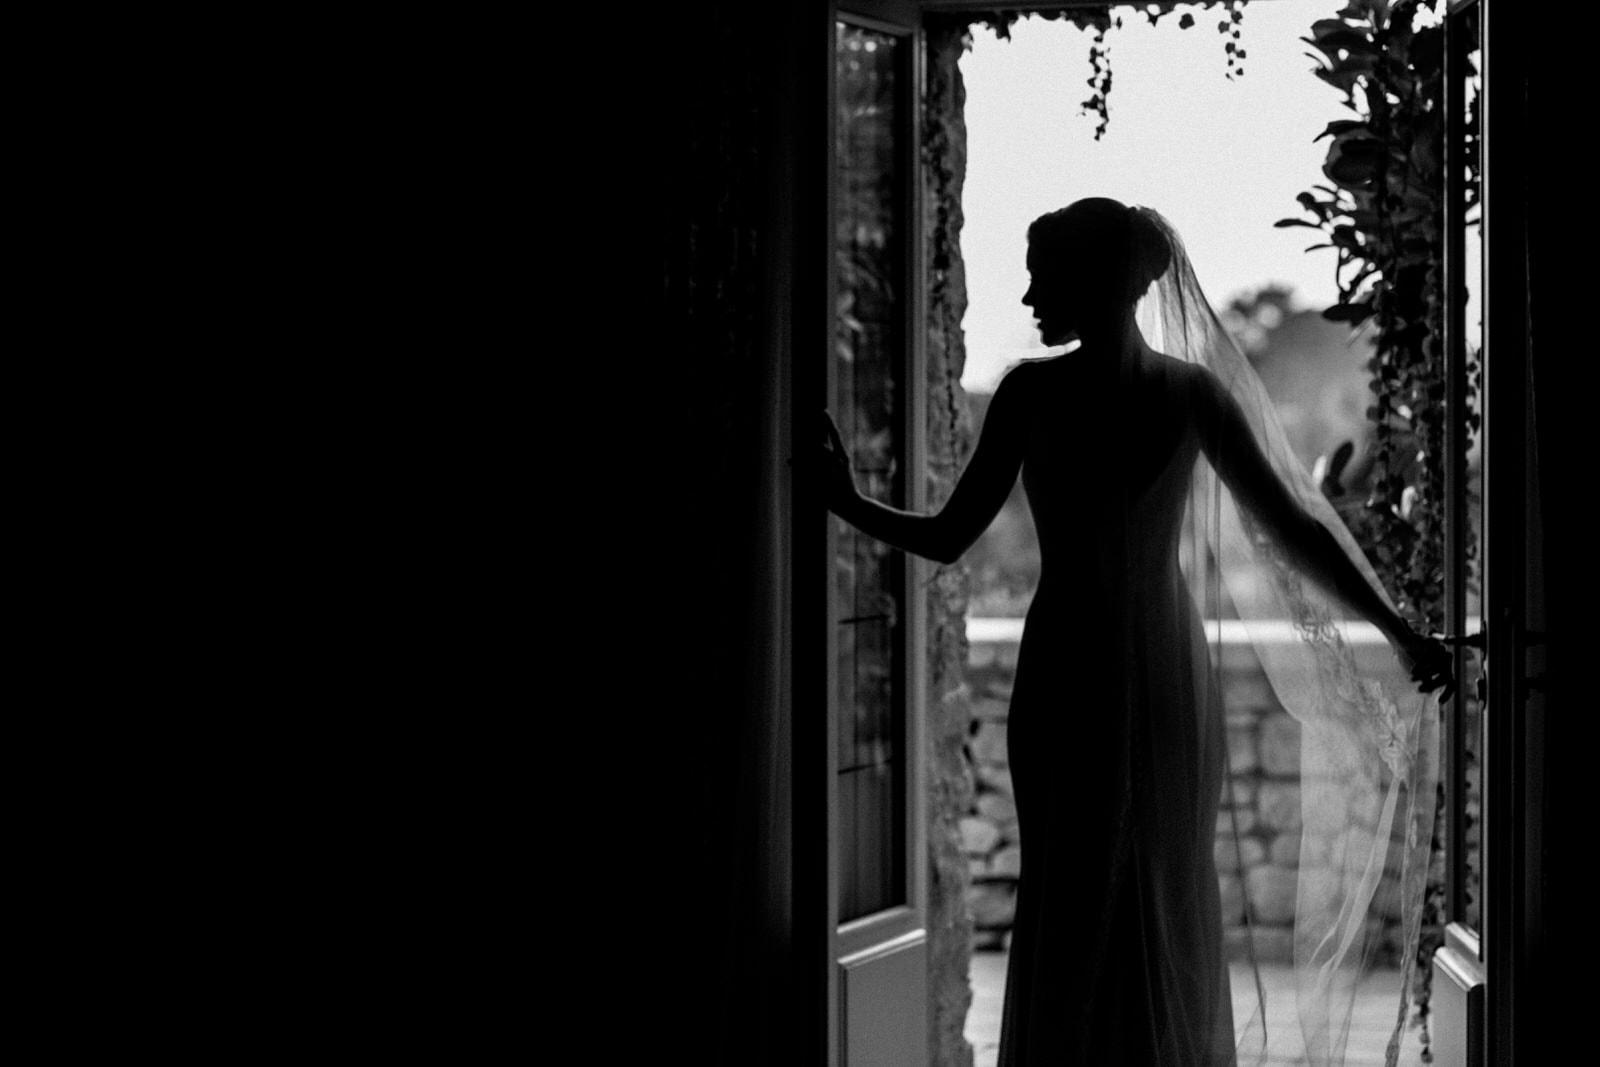 silhouette of bride in doorway